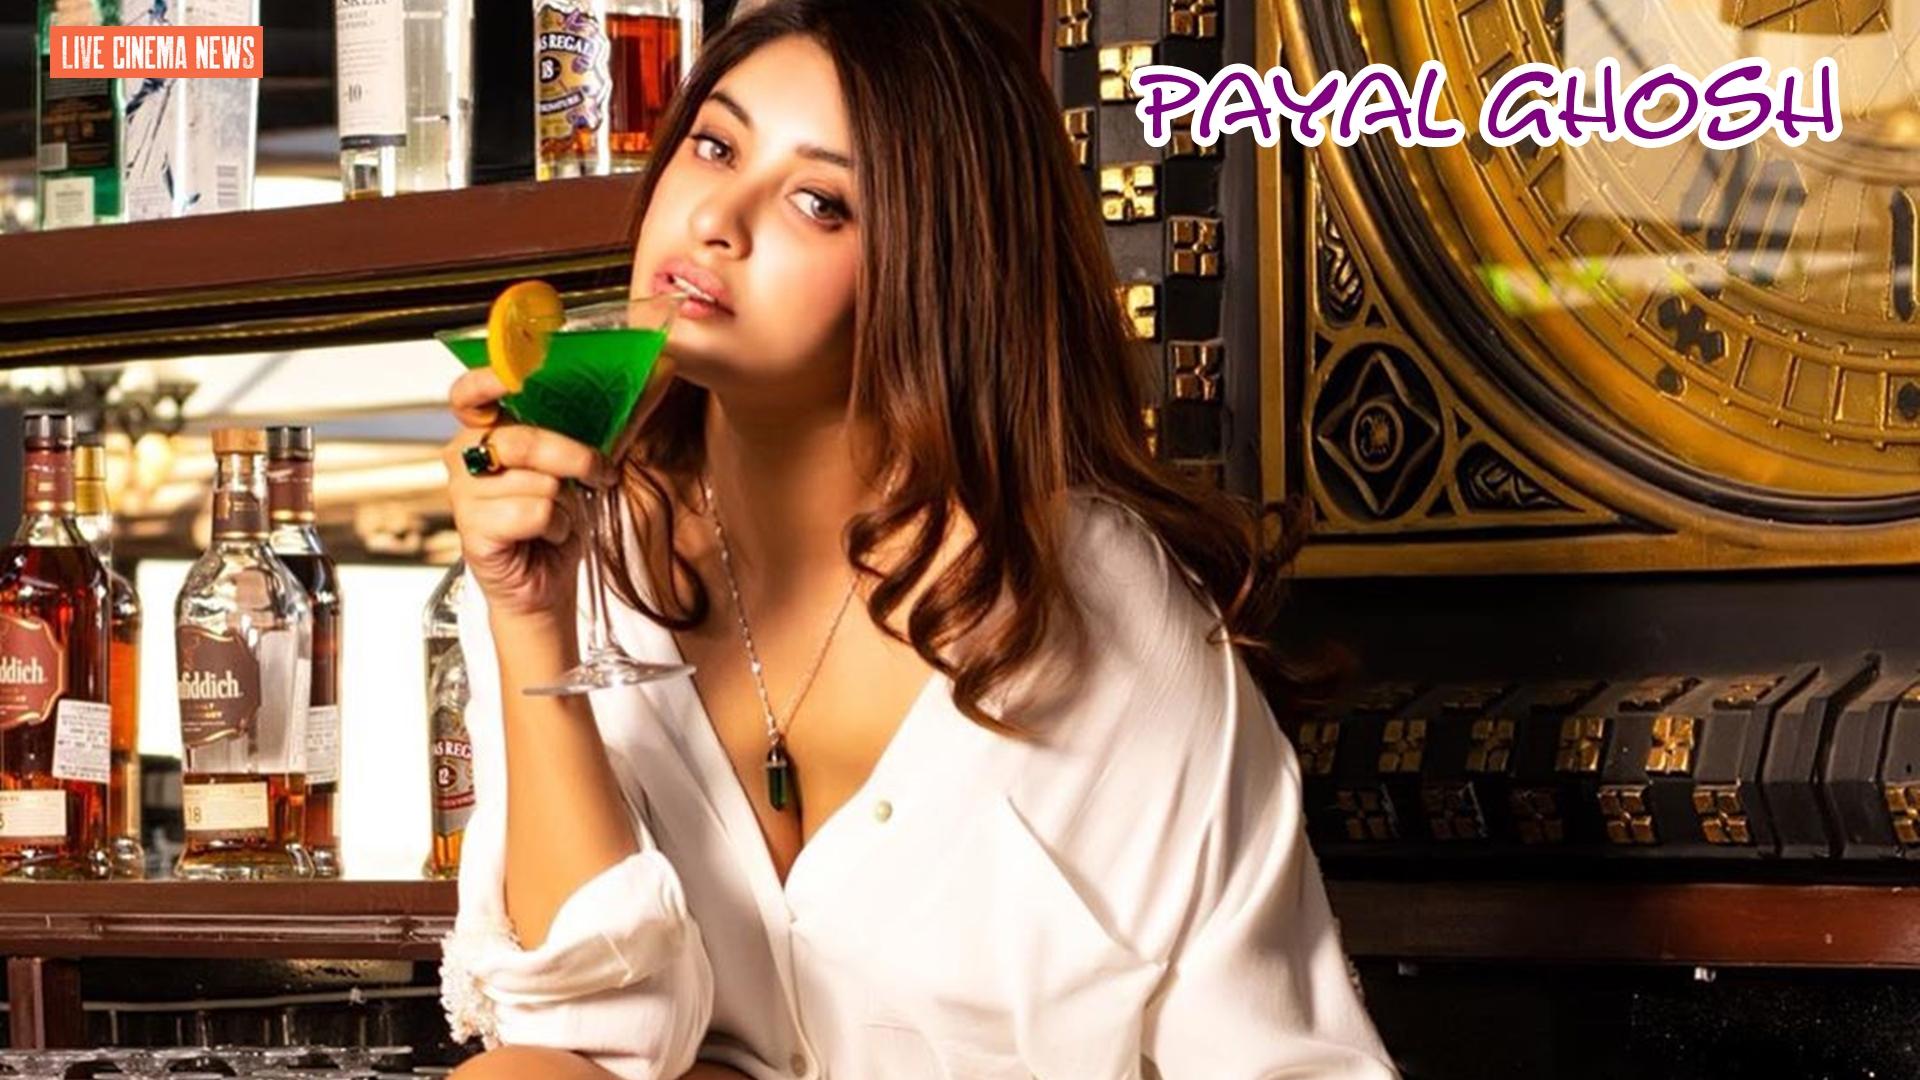 Payal Ghosh Instagram Photos